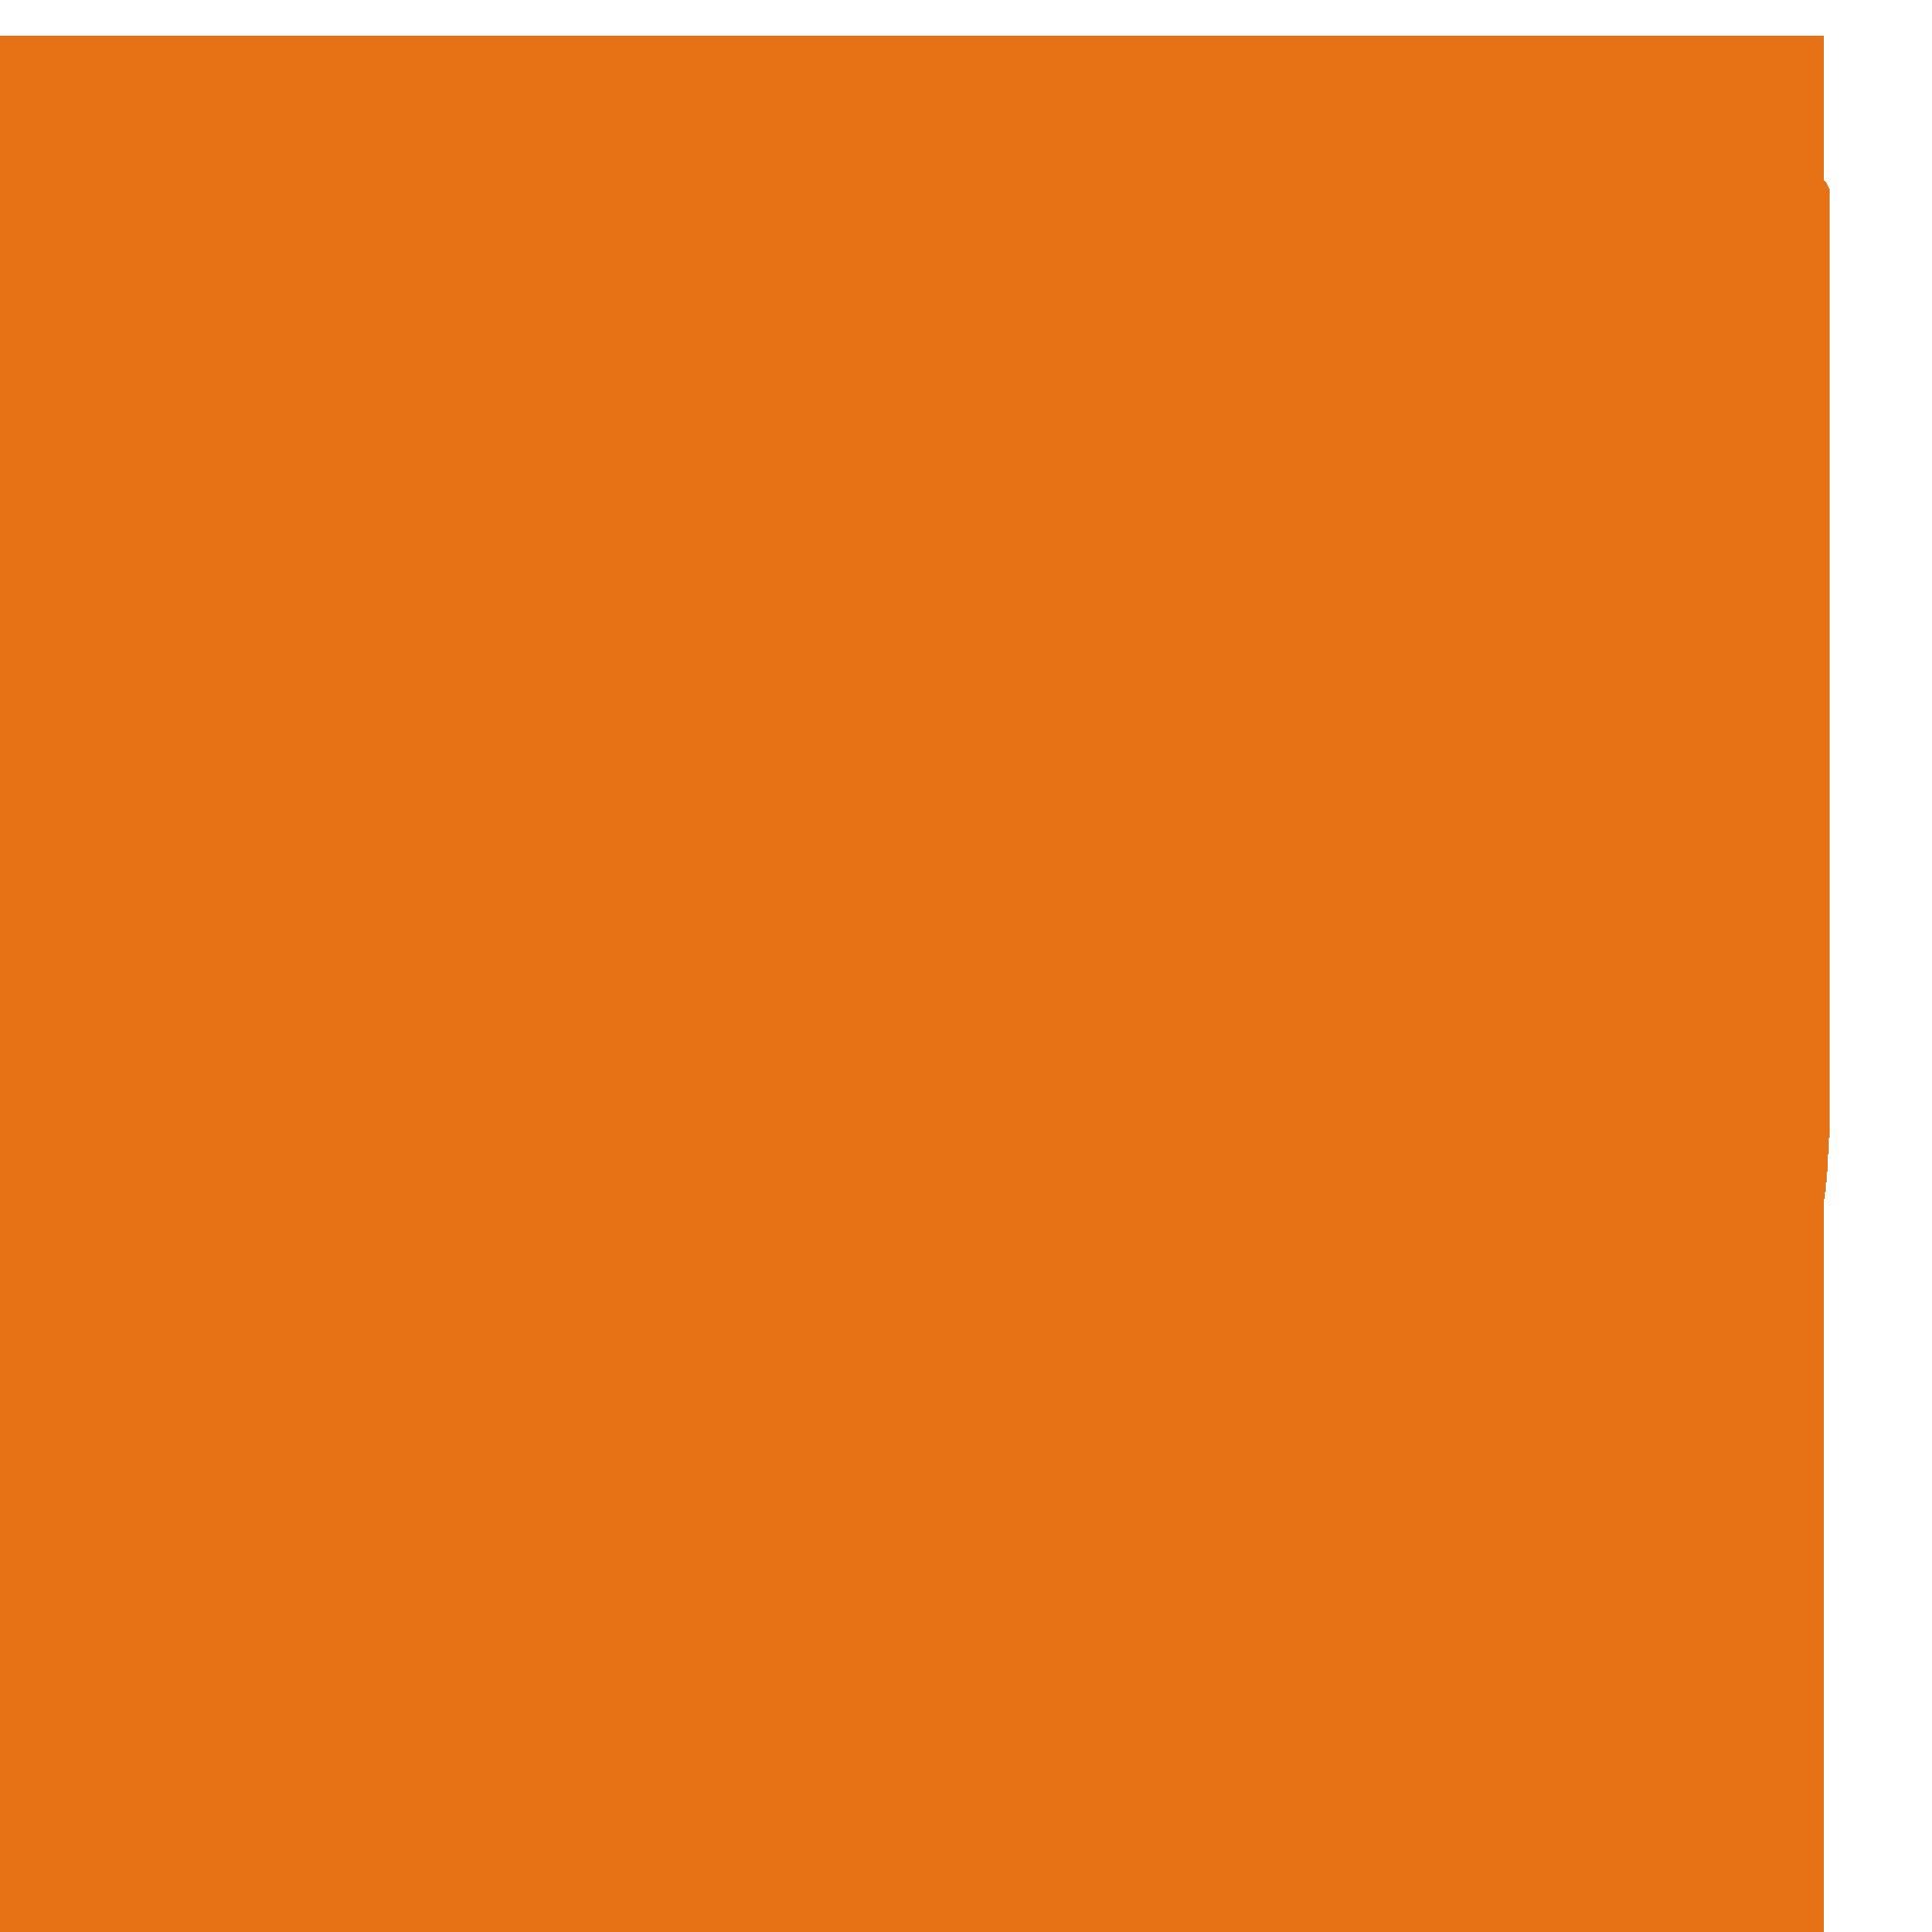 logo-loko-uap-indorailtour.png